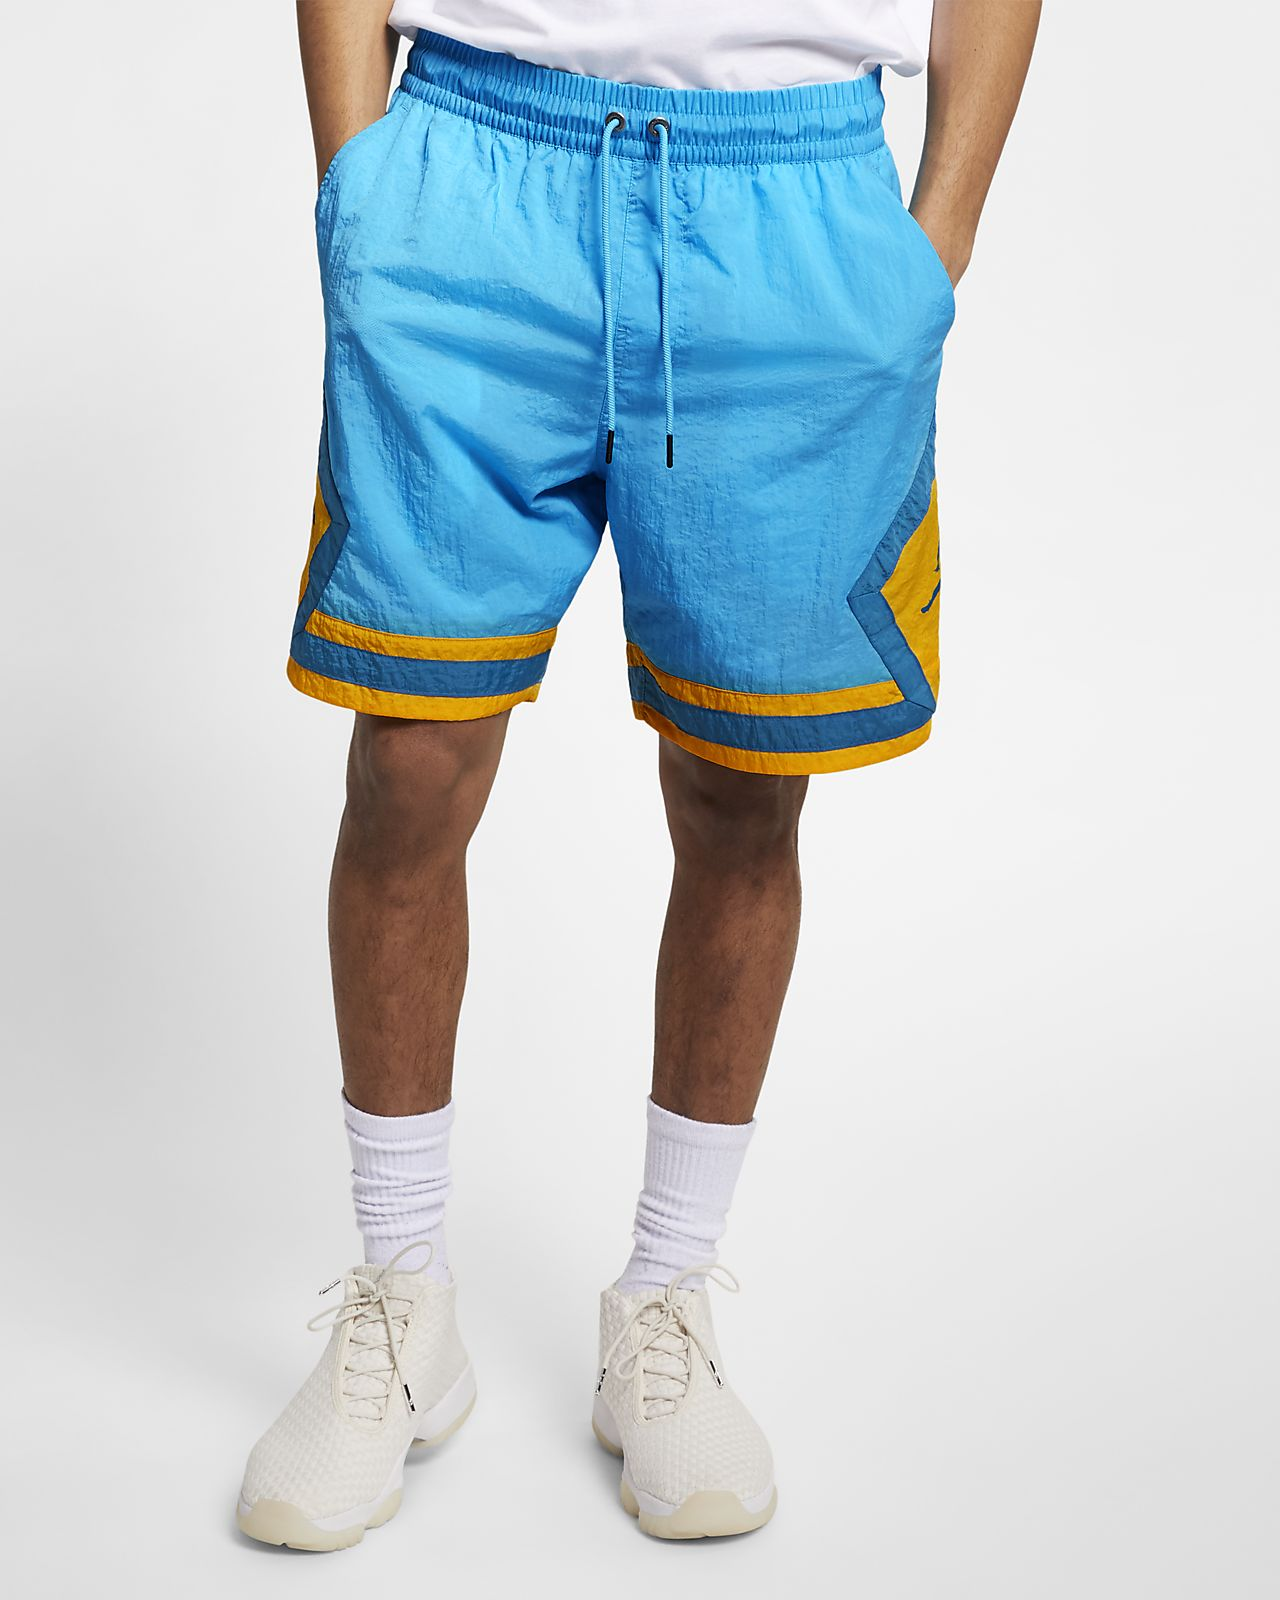 9338e0c3ac2 Shorts de hombre Jordan Diamond Poolside. Nike.com MX